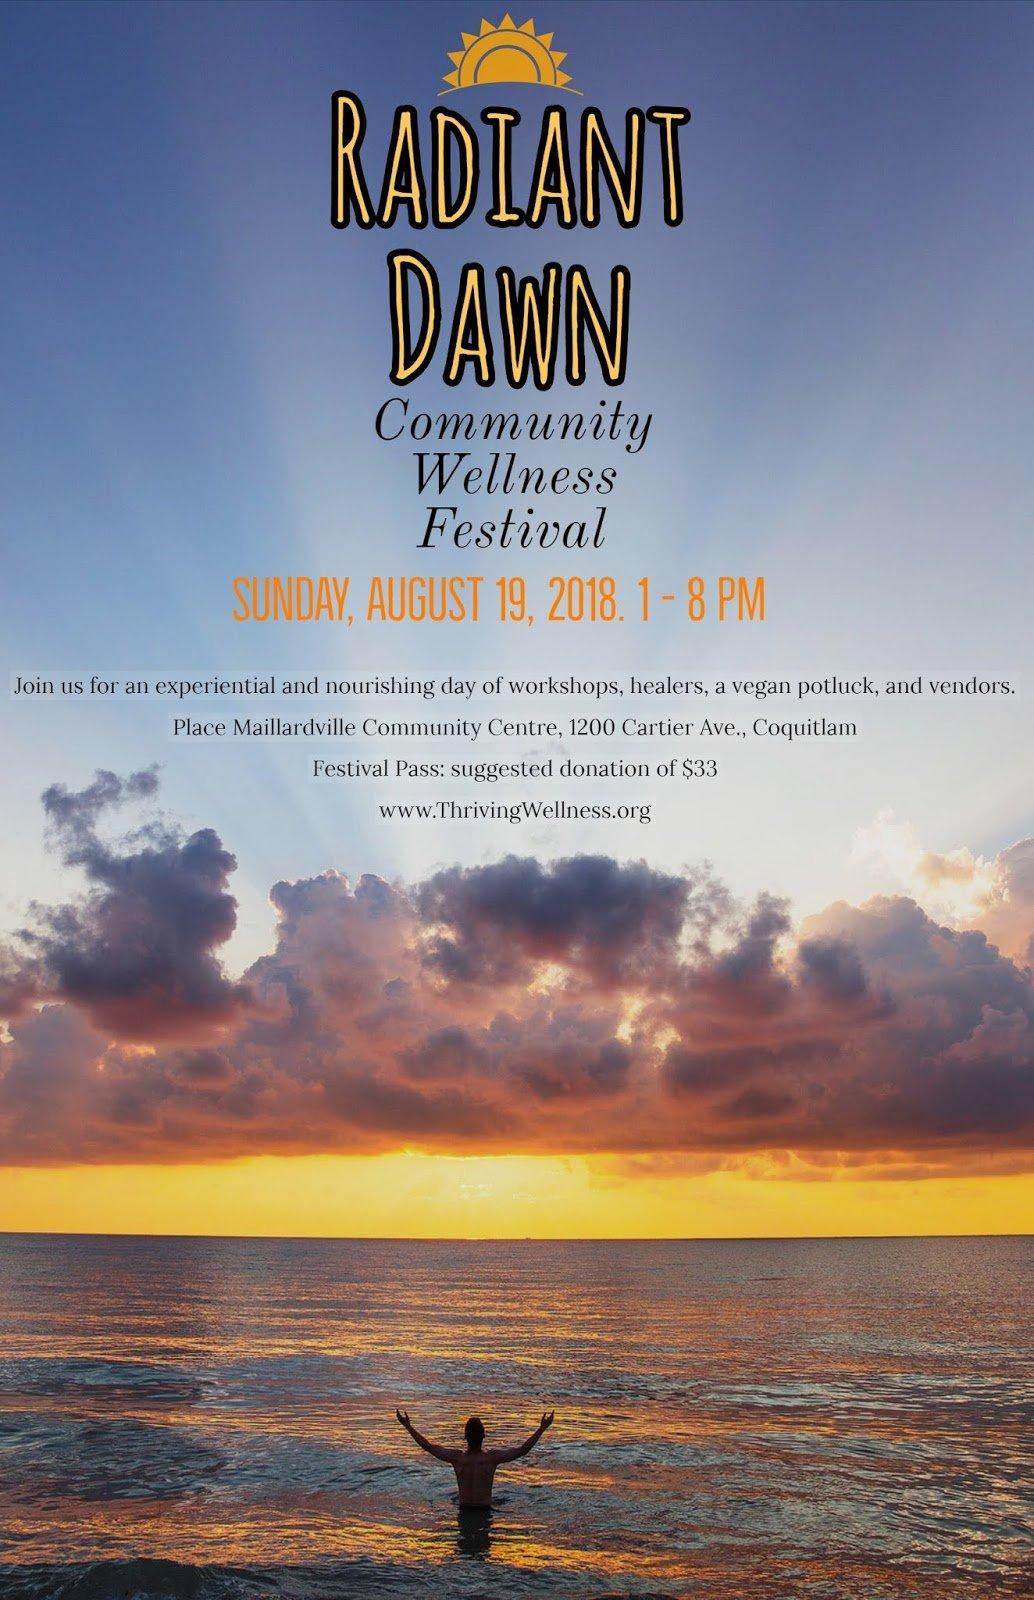 Radiant Dawn: Wellness Festival In Coquitlam